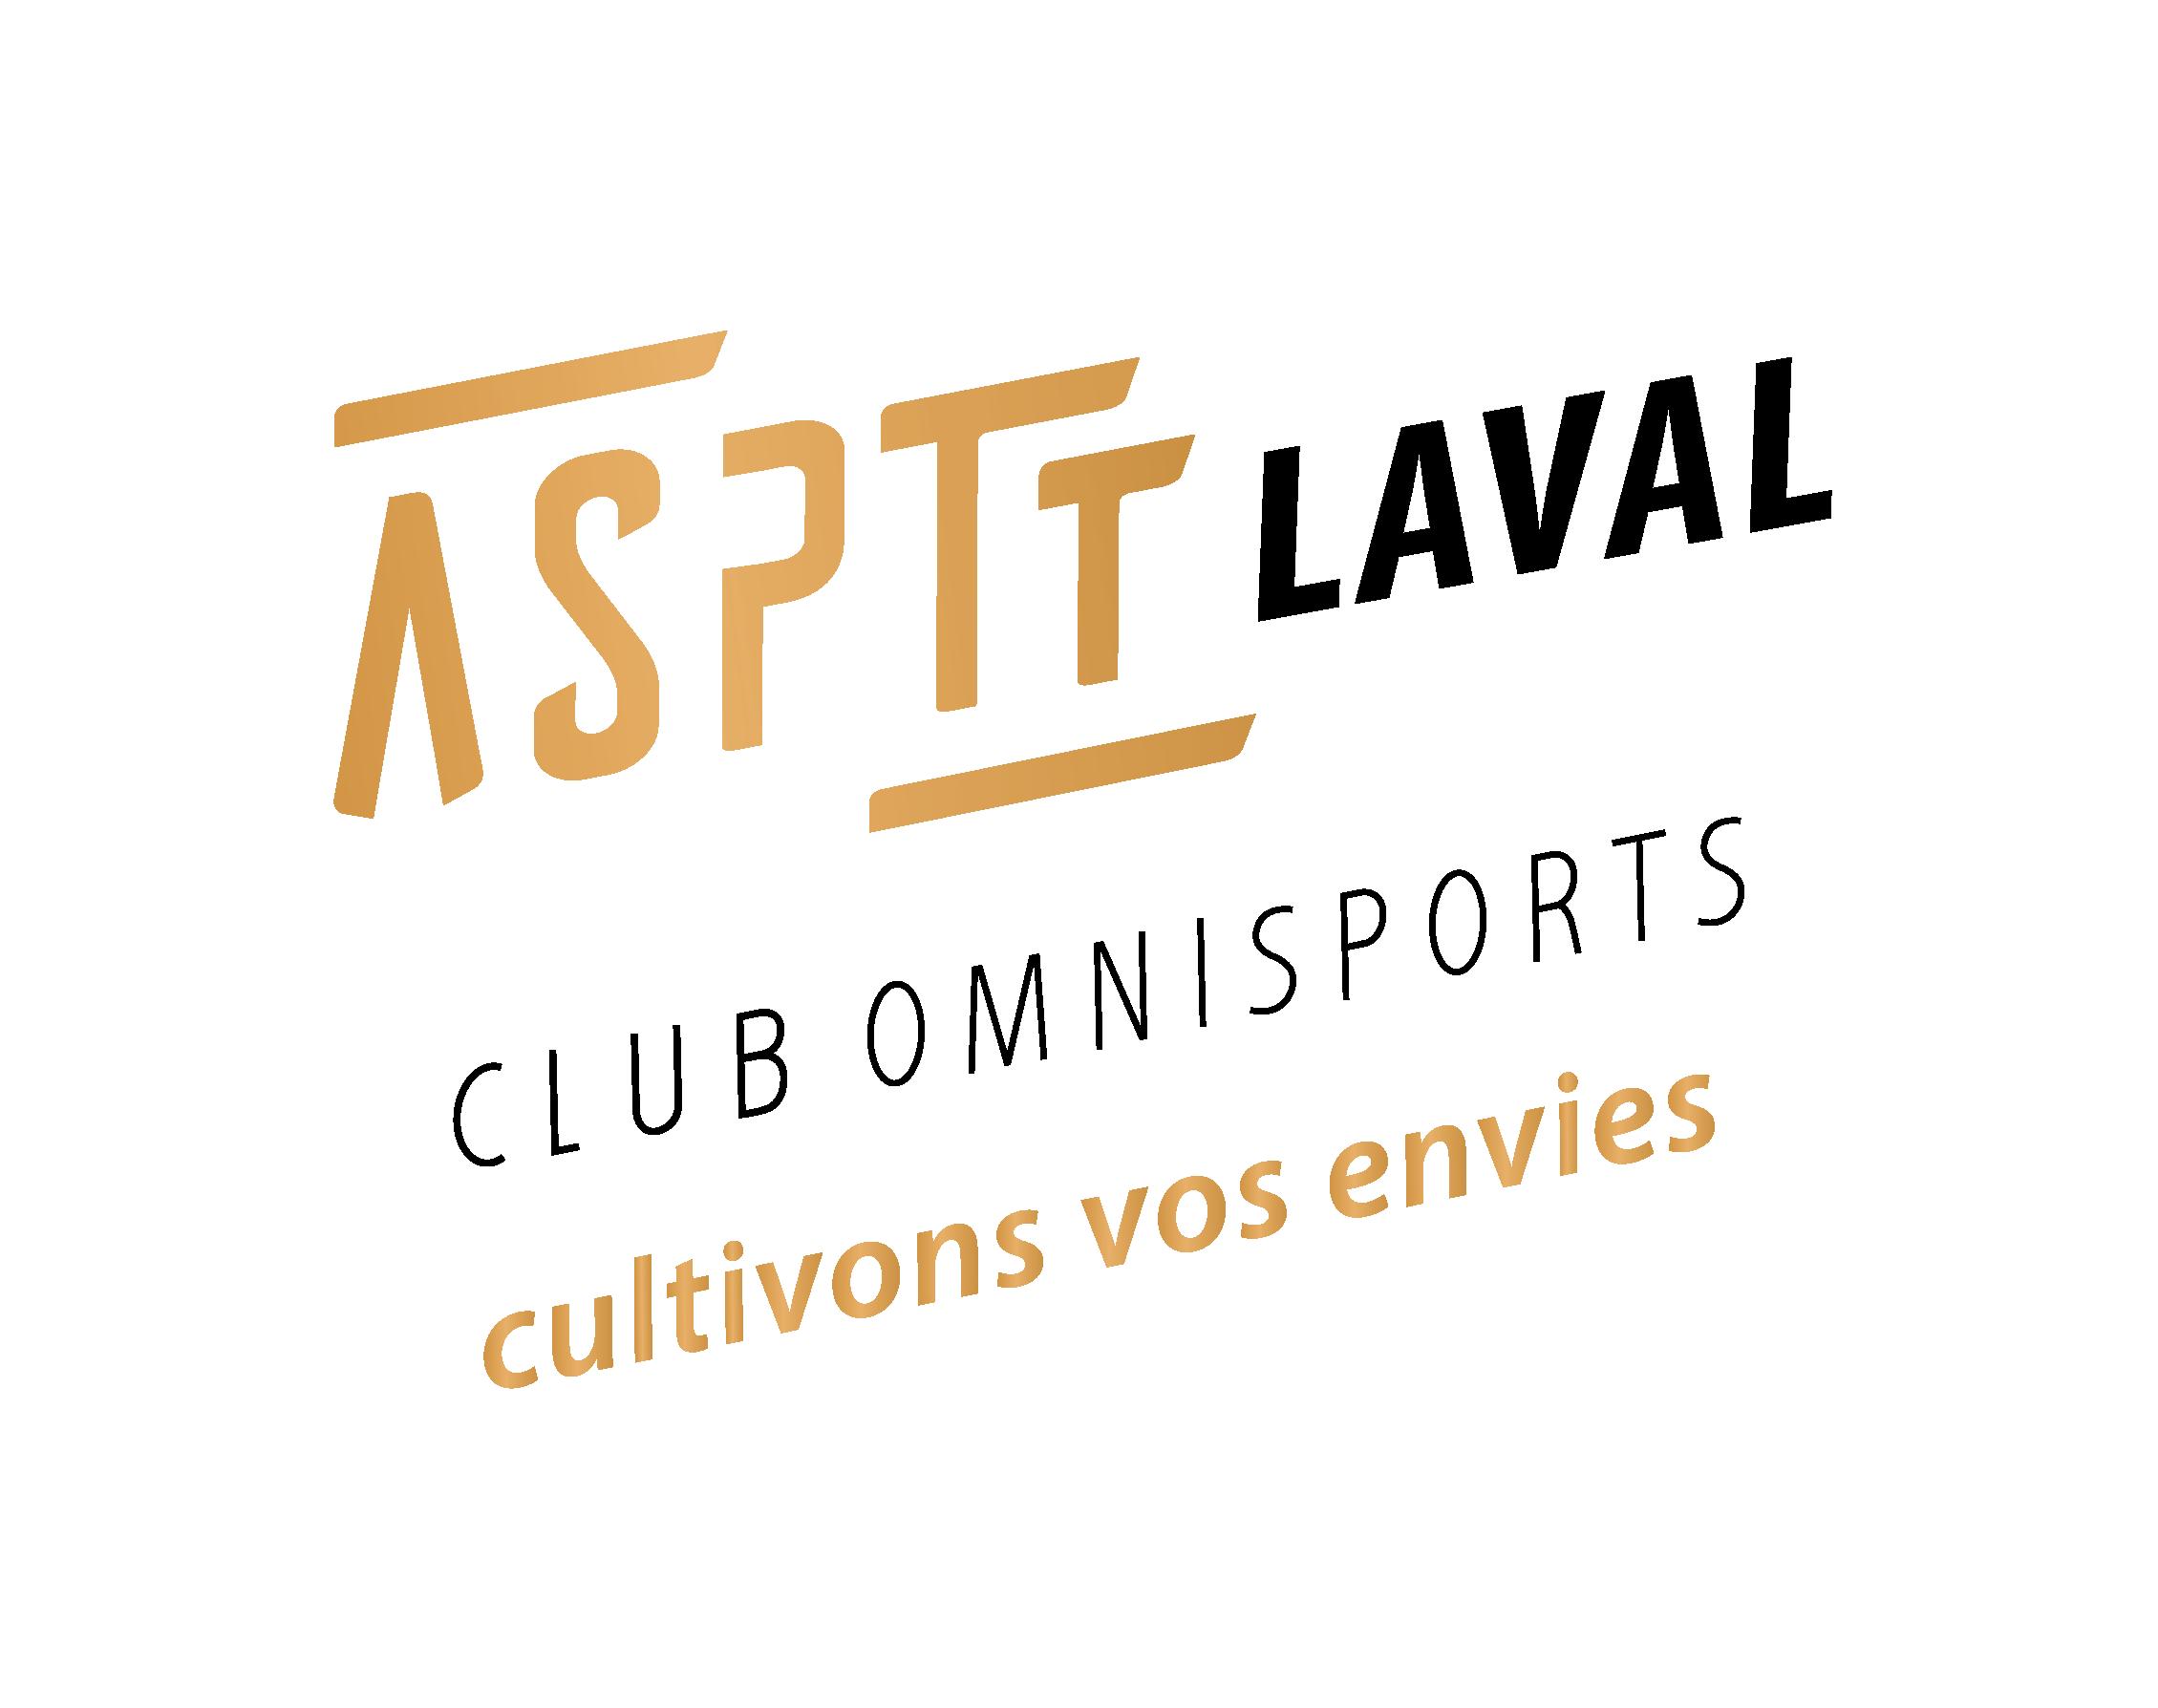 ASPTT Laval, votre club omnisports, 1 CLUB - 14 ACTIVITES